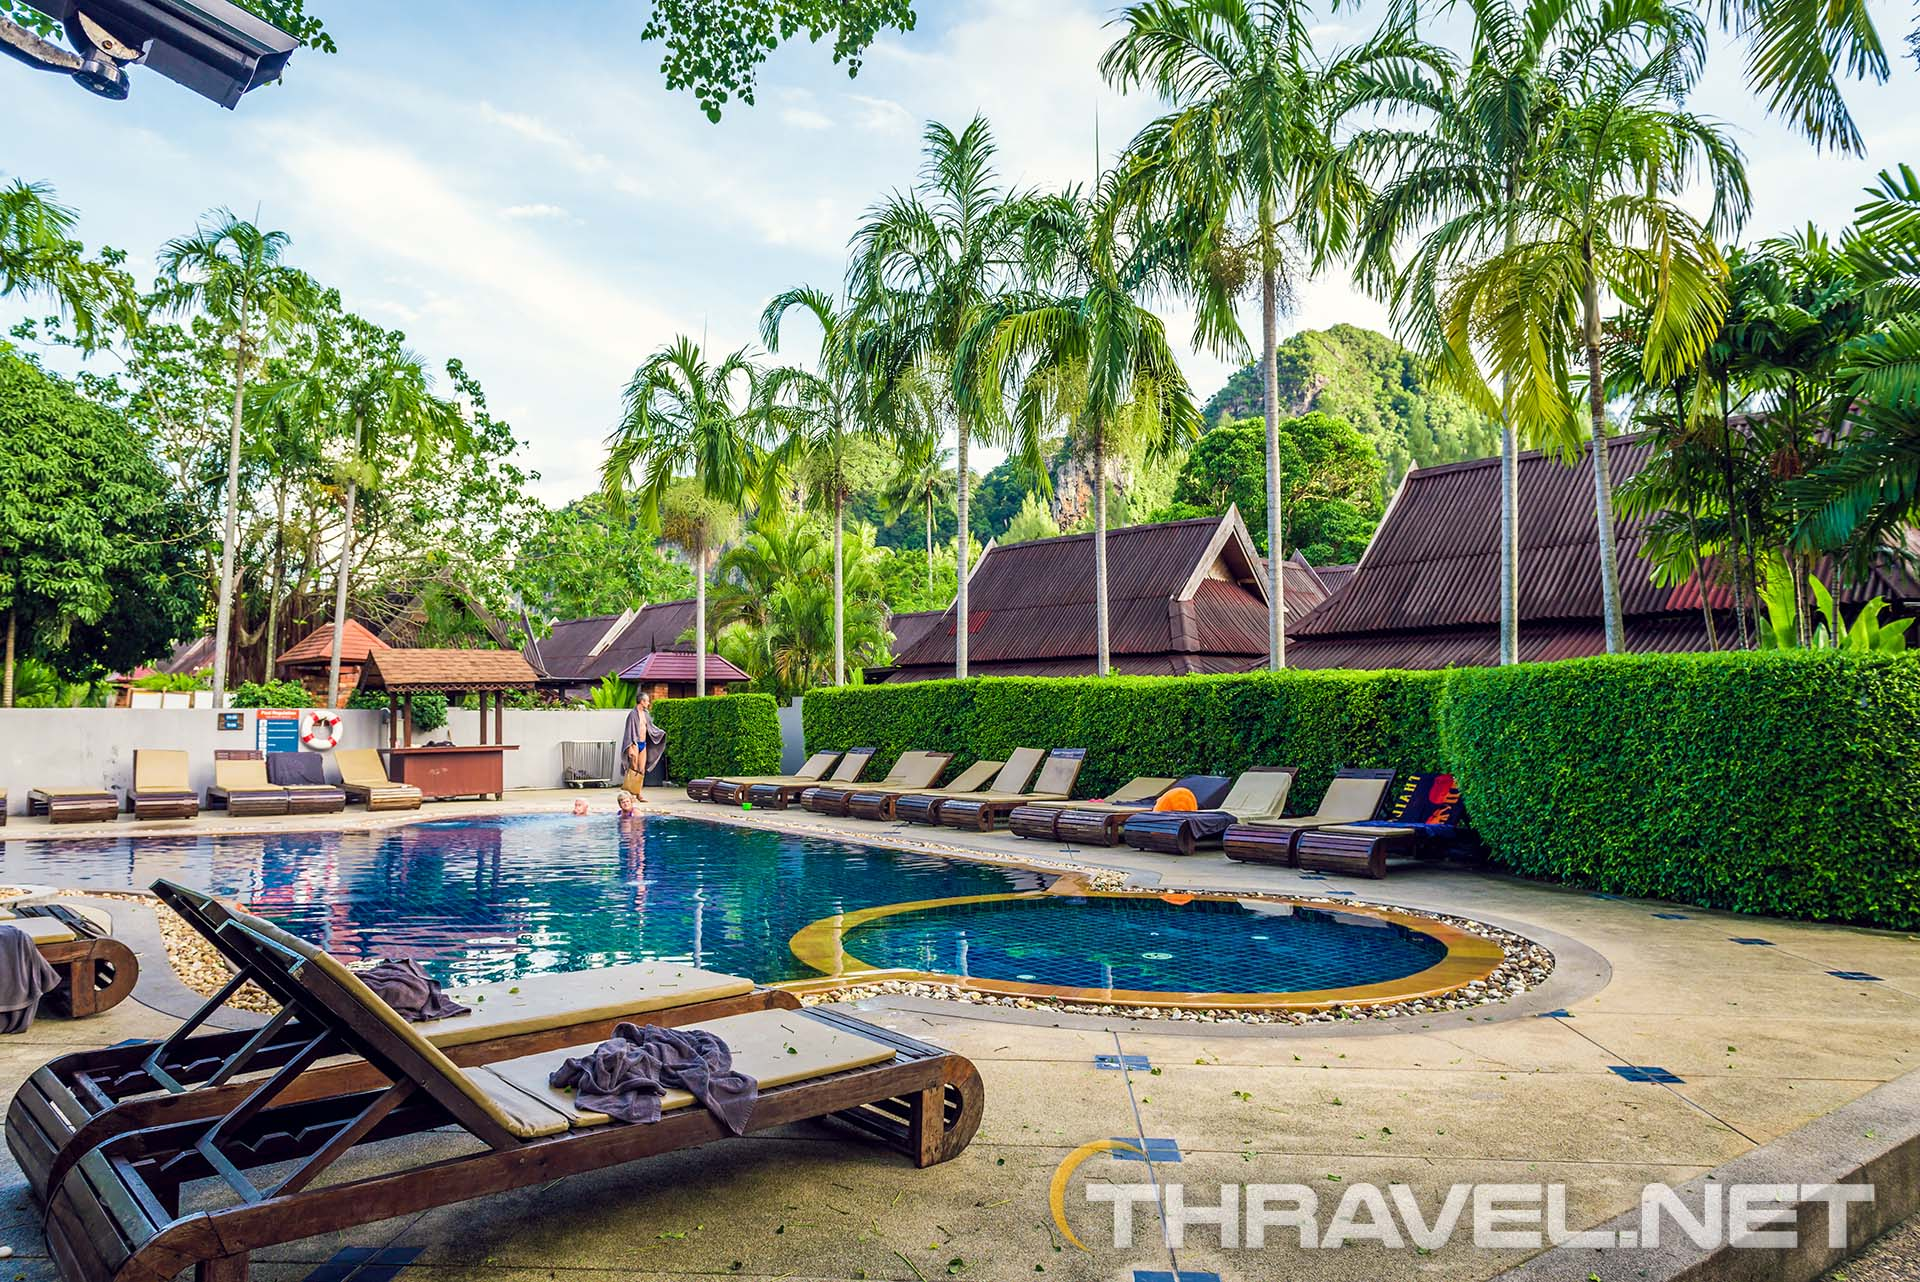 Railey-beach-hotels-pool-view